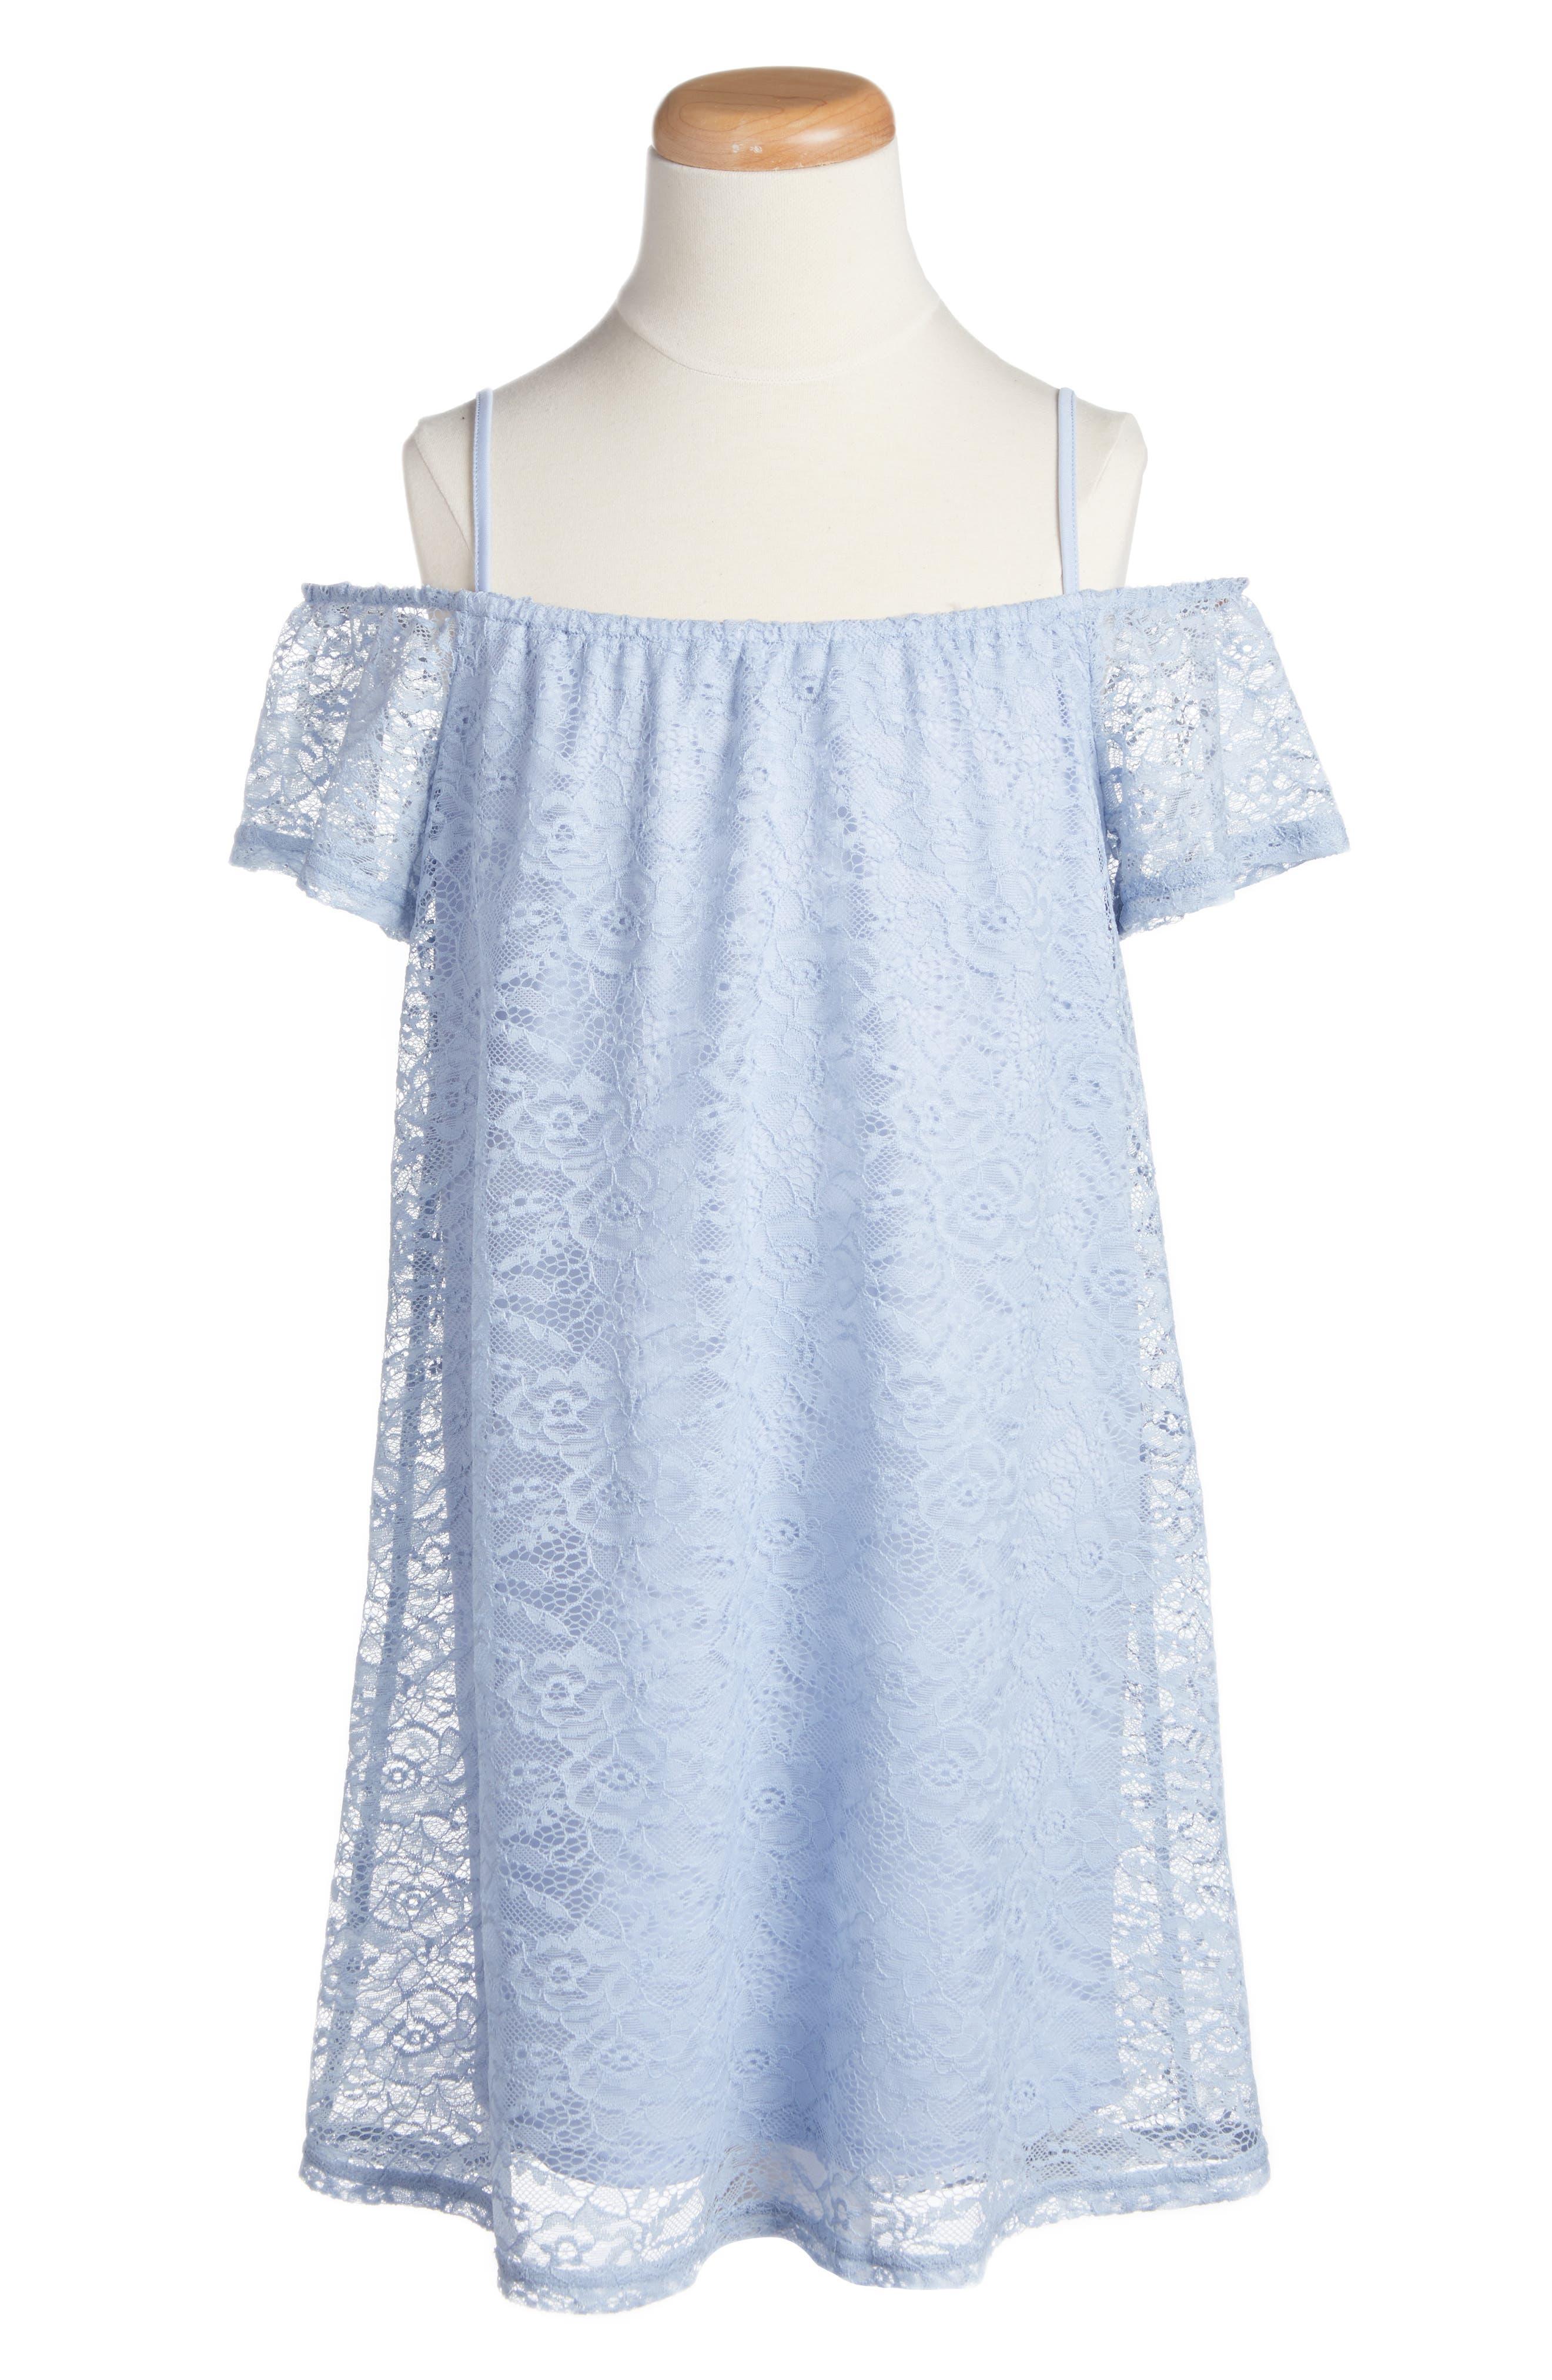 Main Image - Love, Fire Lace Shift Dress (Big Girls)